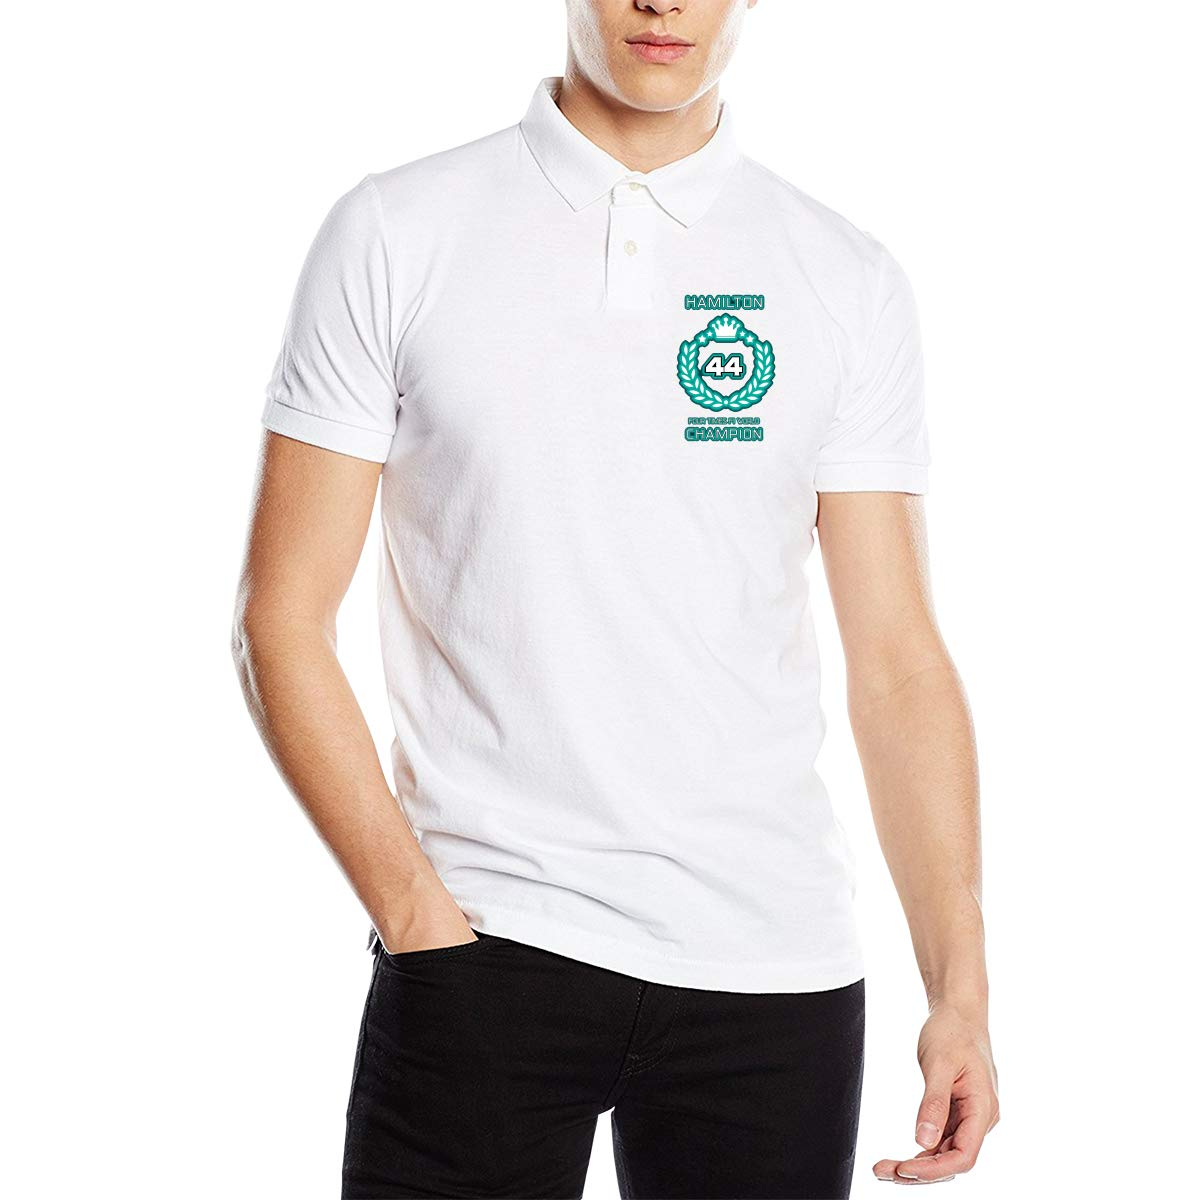 Arilce Racing Driver Lewis Hamilton 44 Four Times F1 World Champion Men Polo Shirt Short Sleeve Lapel Blouse Black